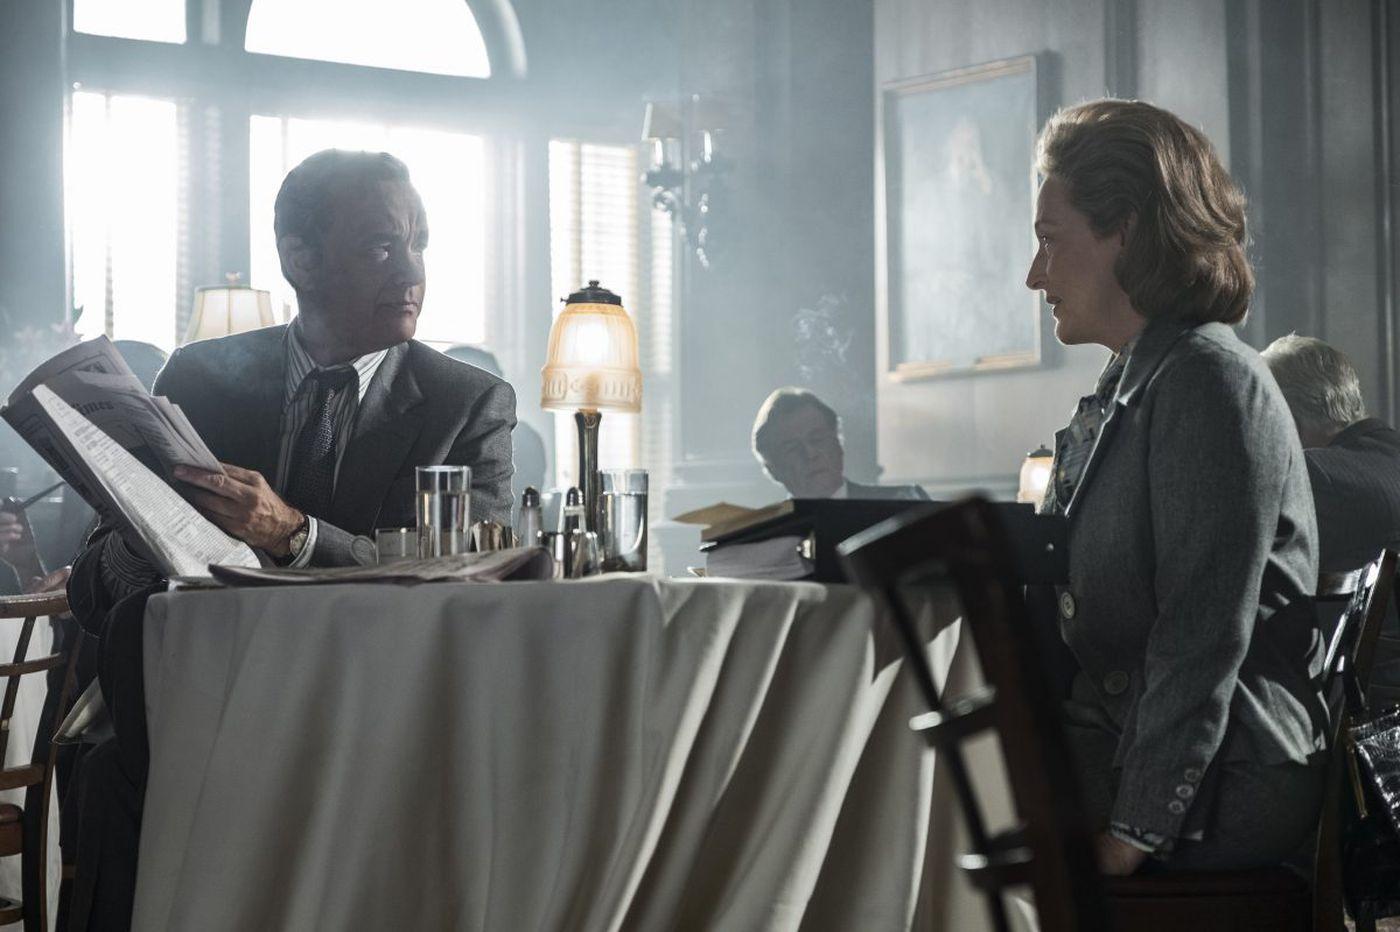 'The Post': Tom Hanks and Meryl Streep star in Steven Spielberg's stirring newsroom drama